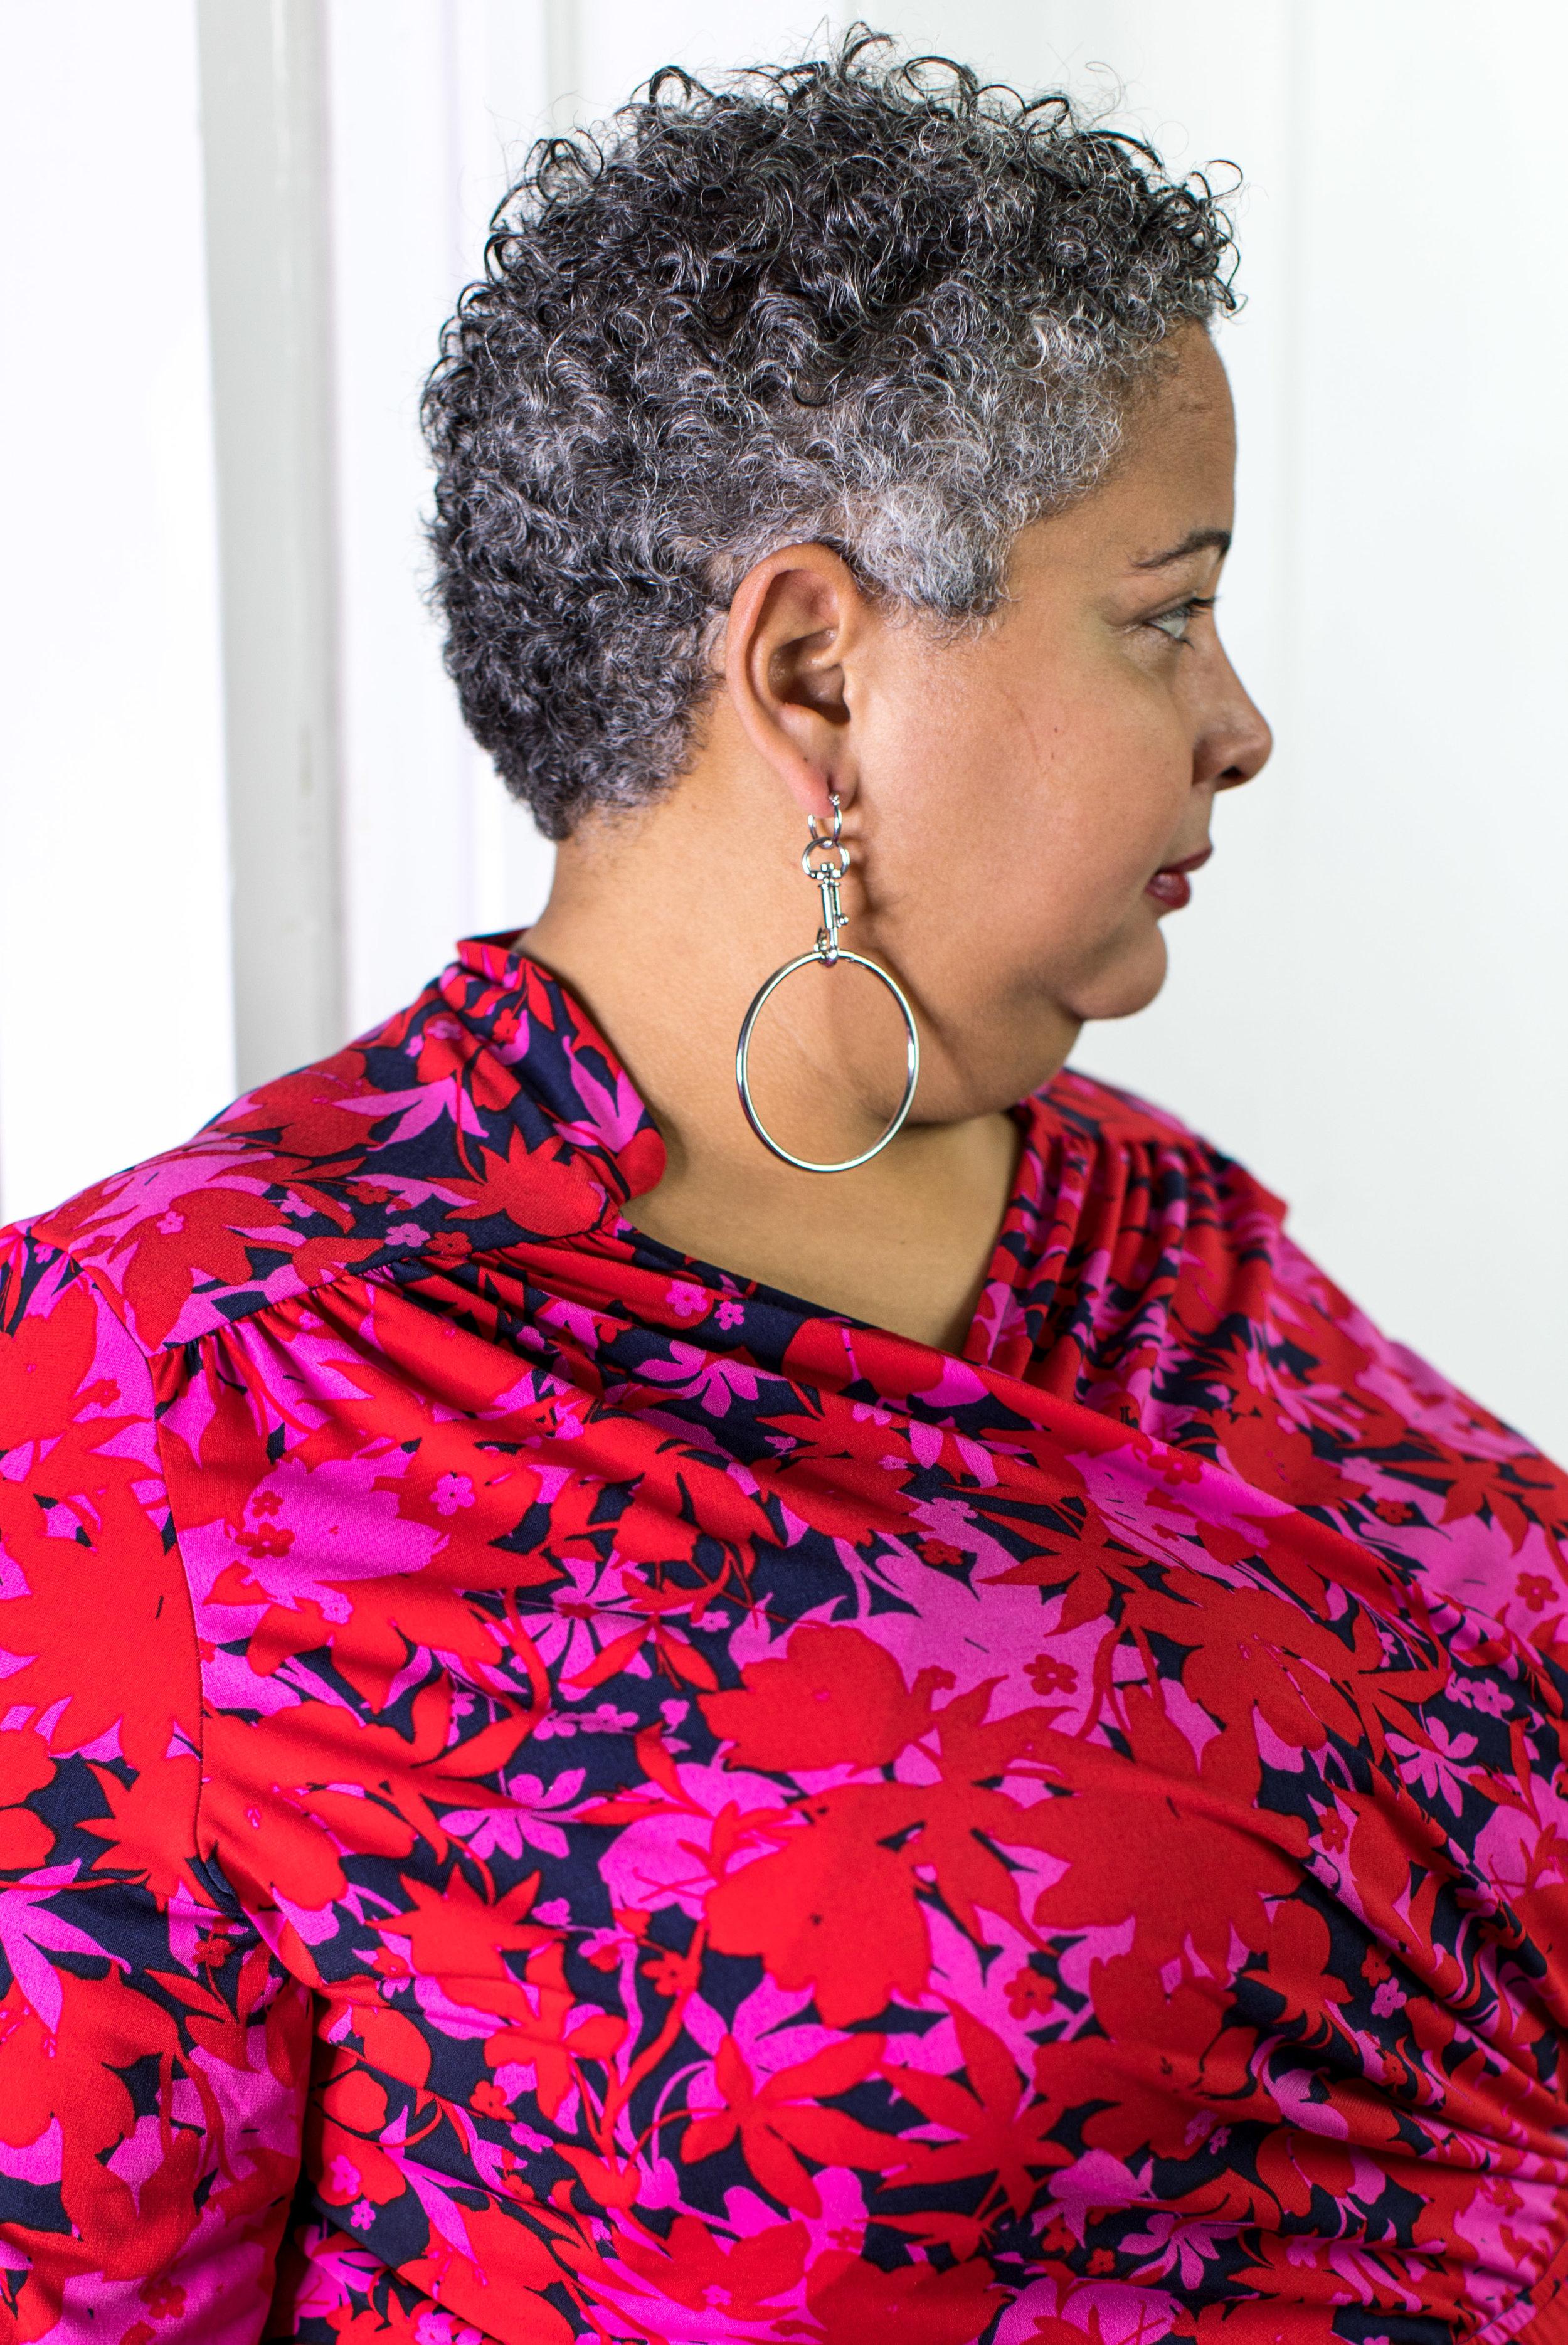 Bridget Shirt Dress - Reviewed by Della